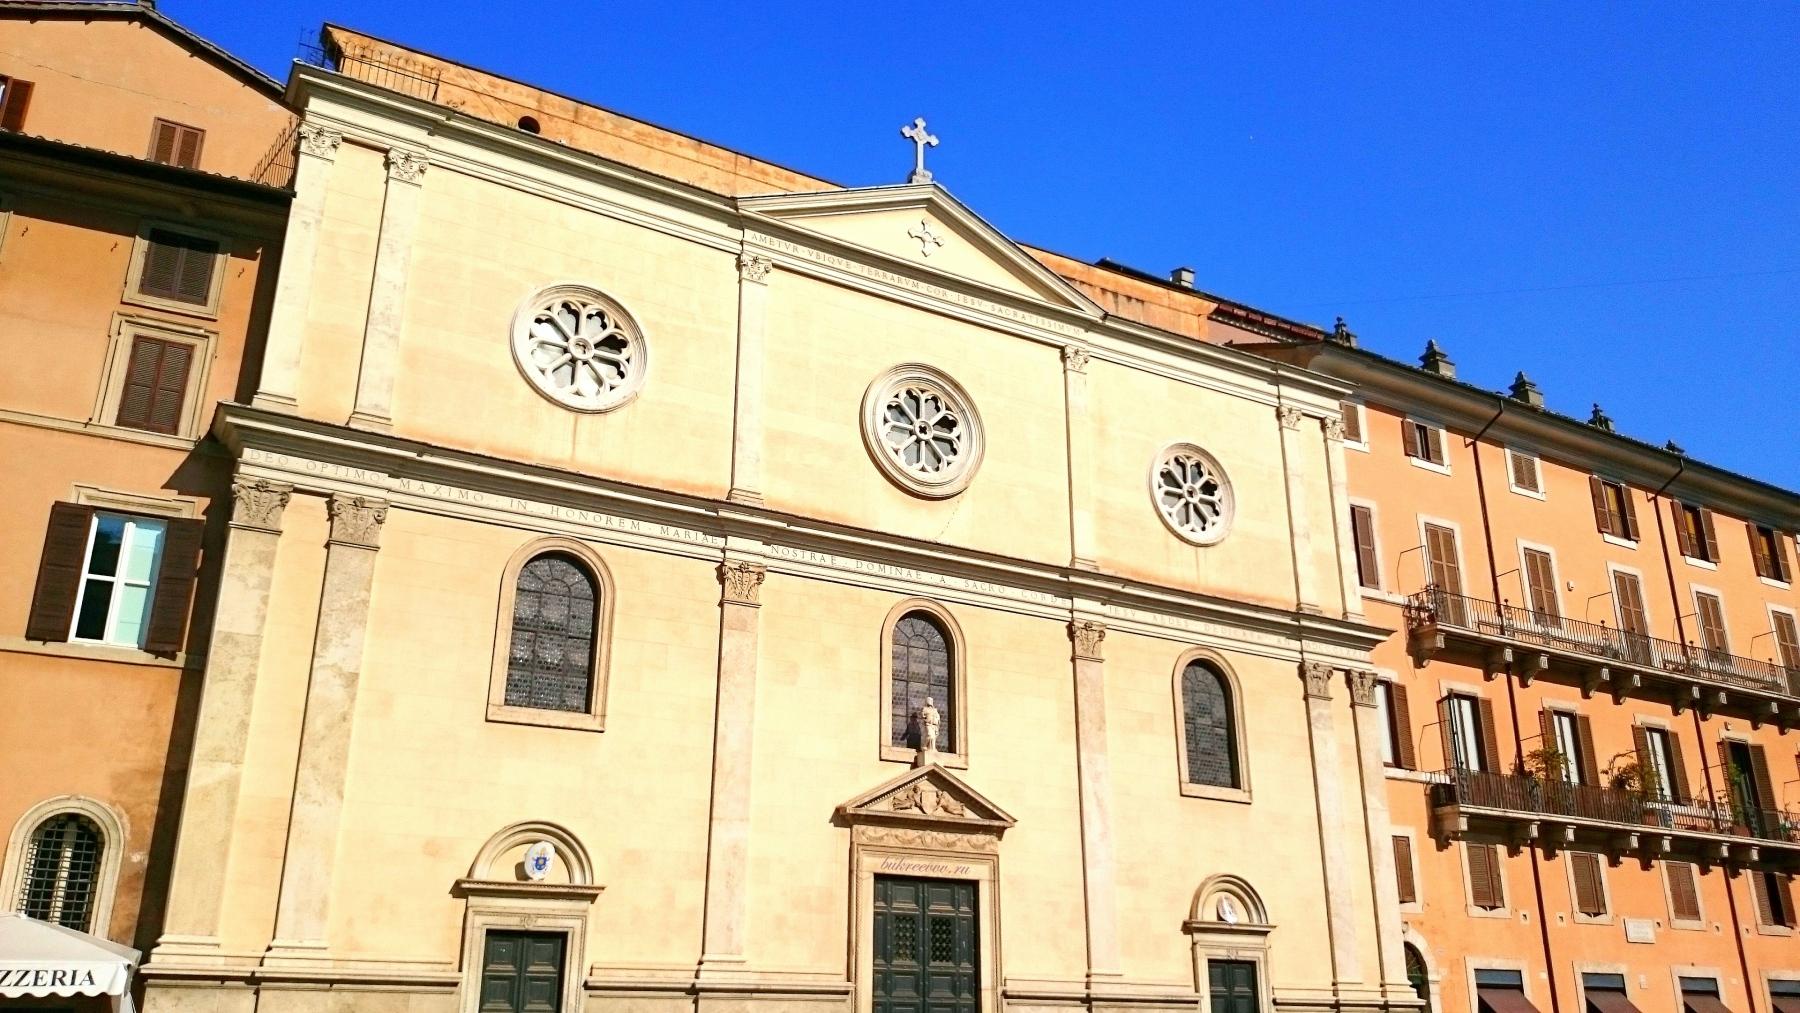 Piazza Navona 61